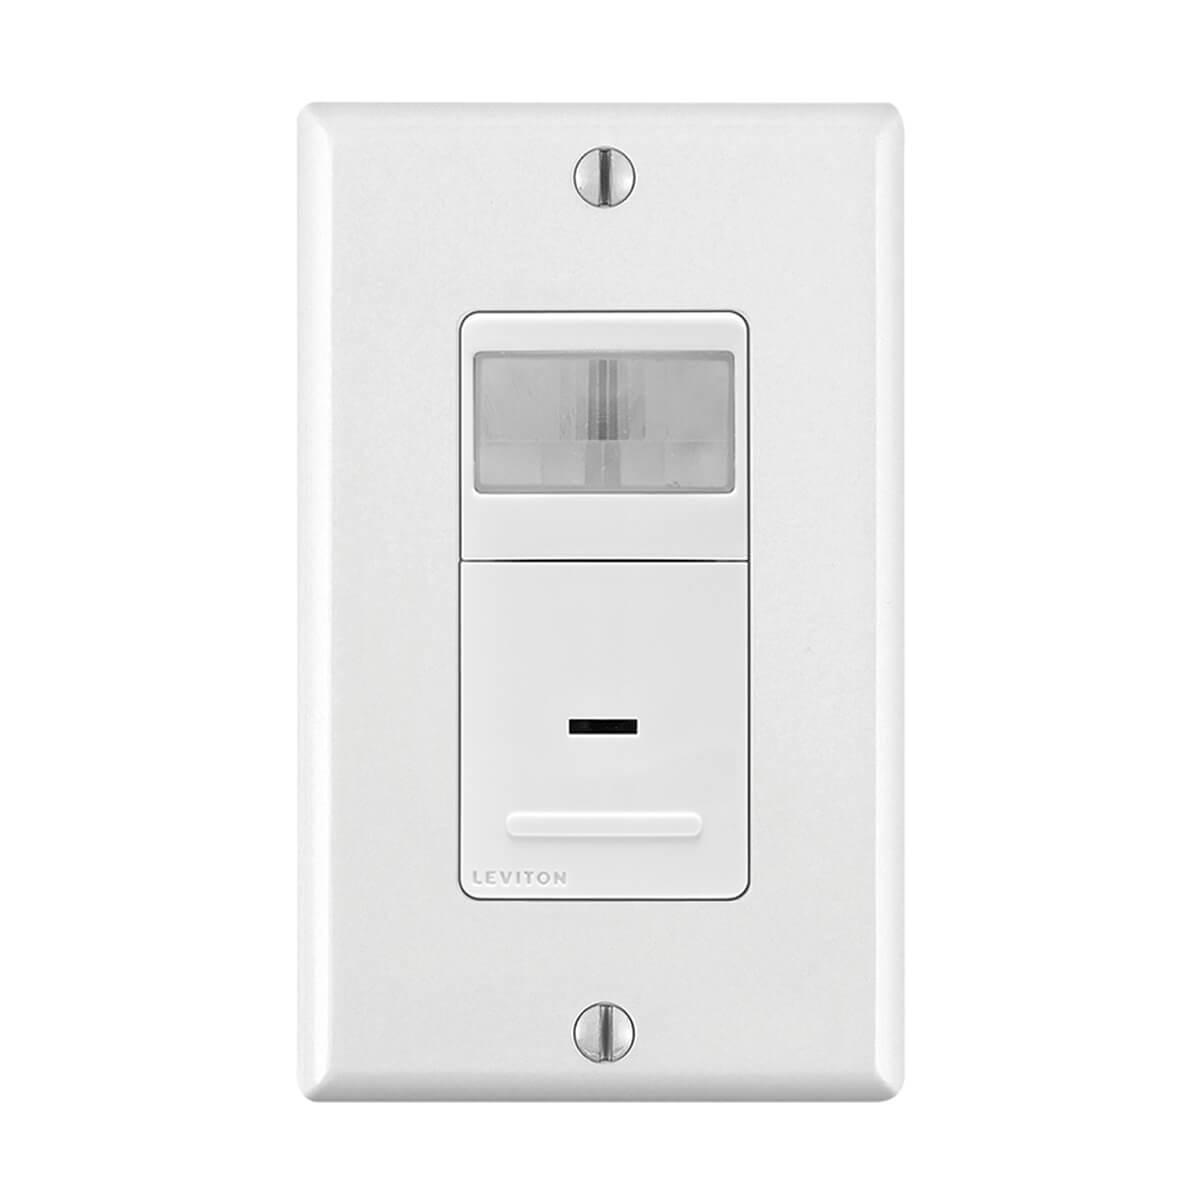 Leviton® Decora Occupancy Sensor Switch